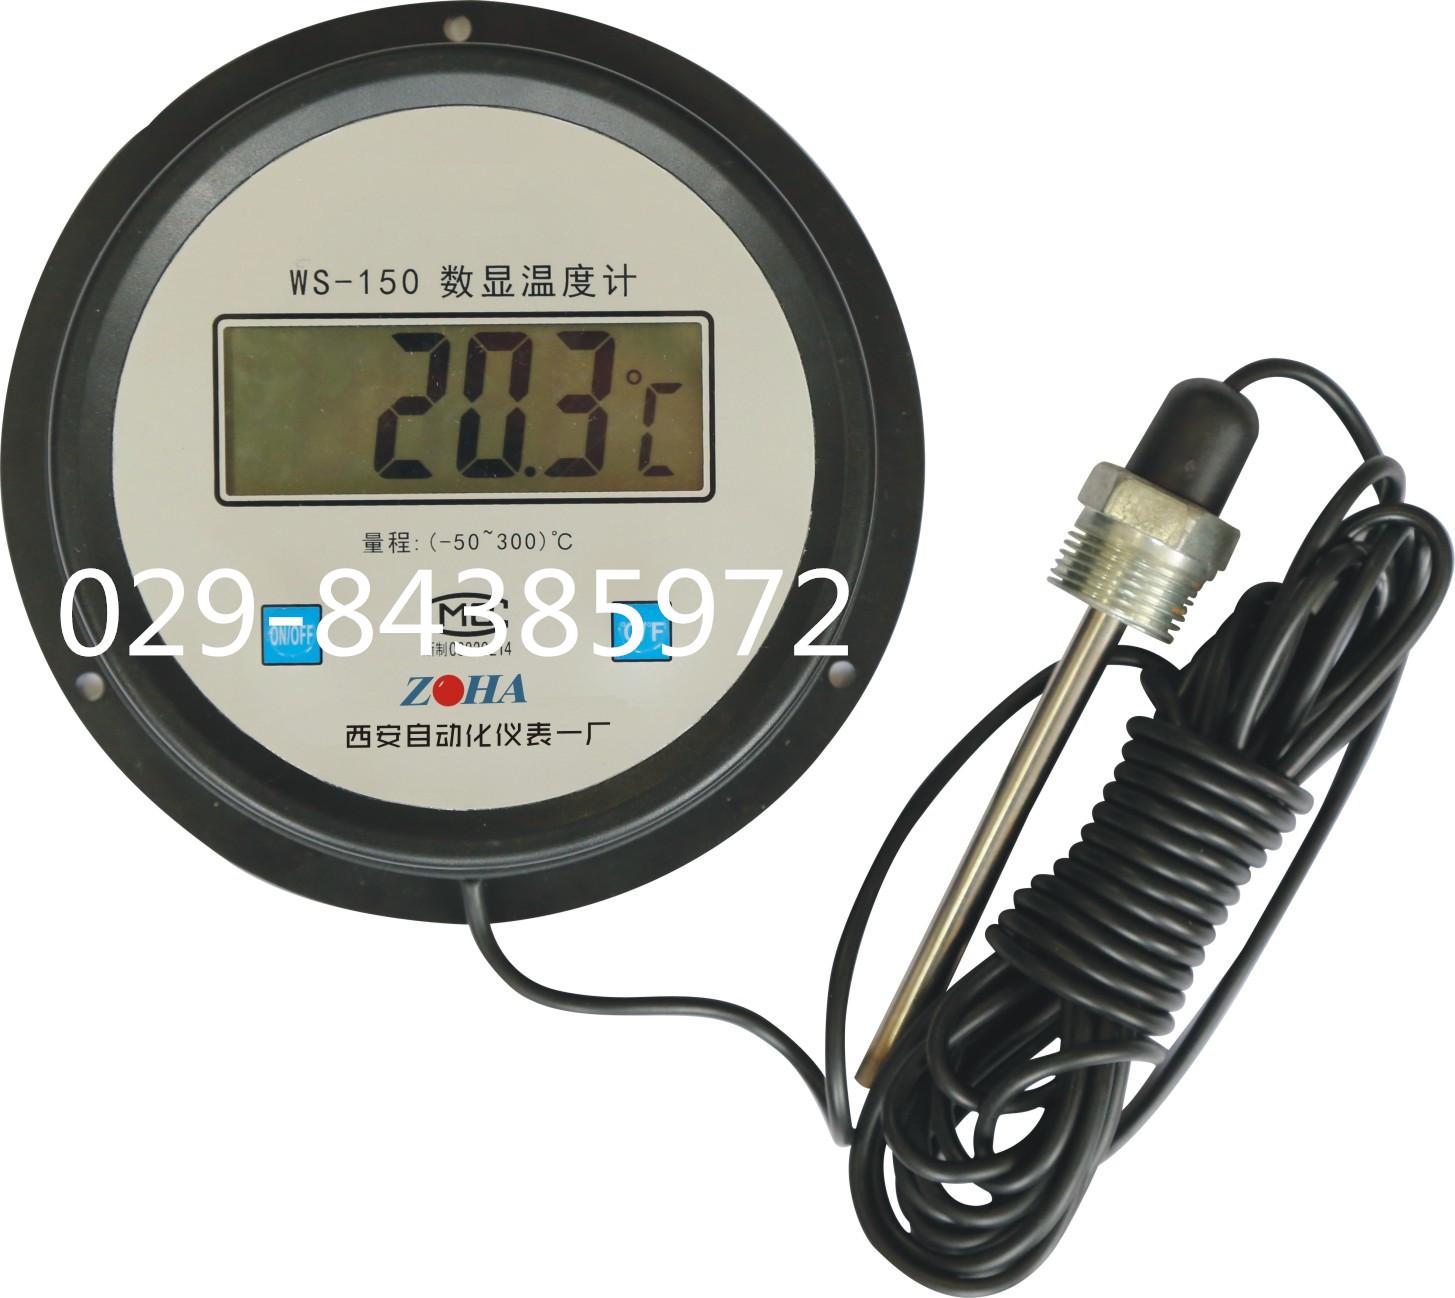 WS-150数显温度计,